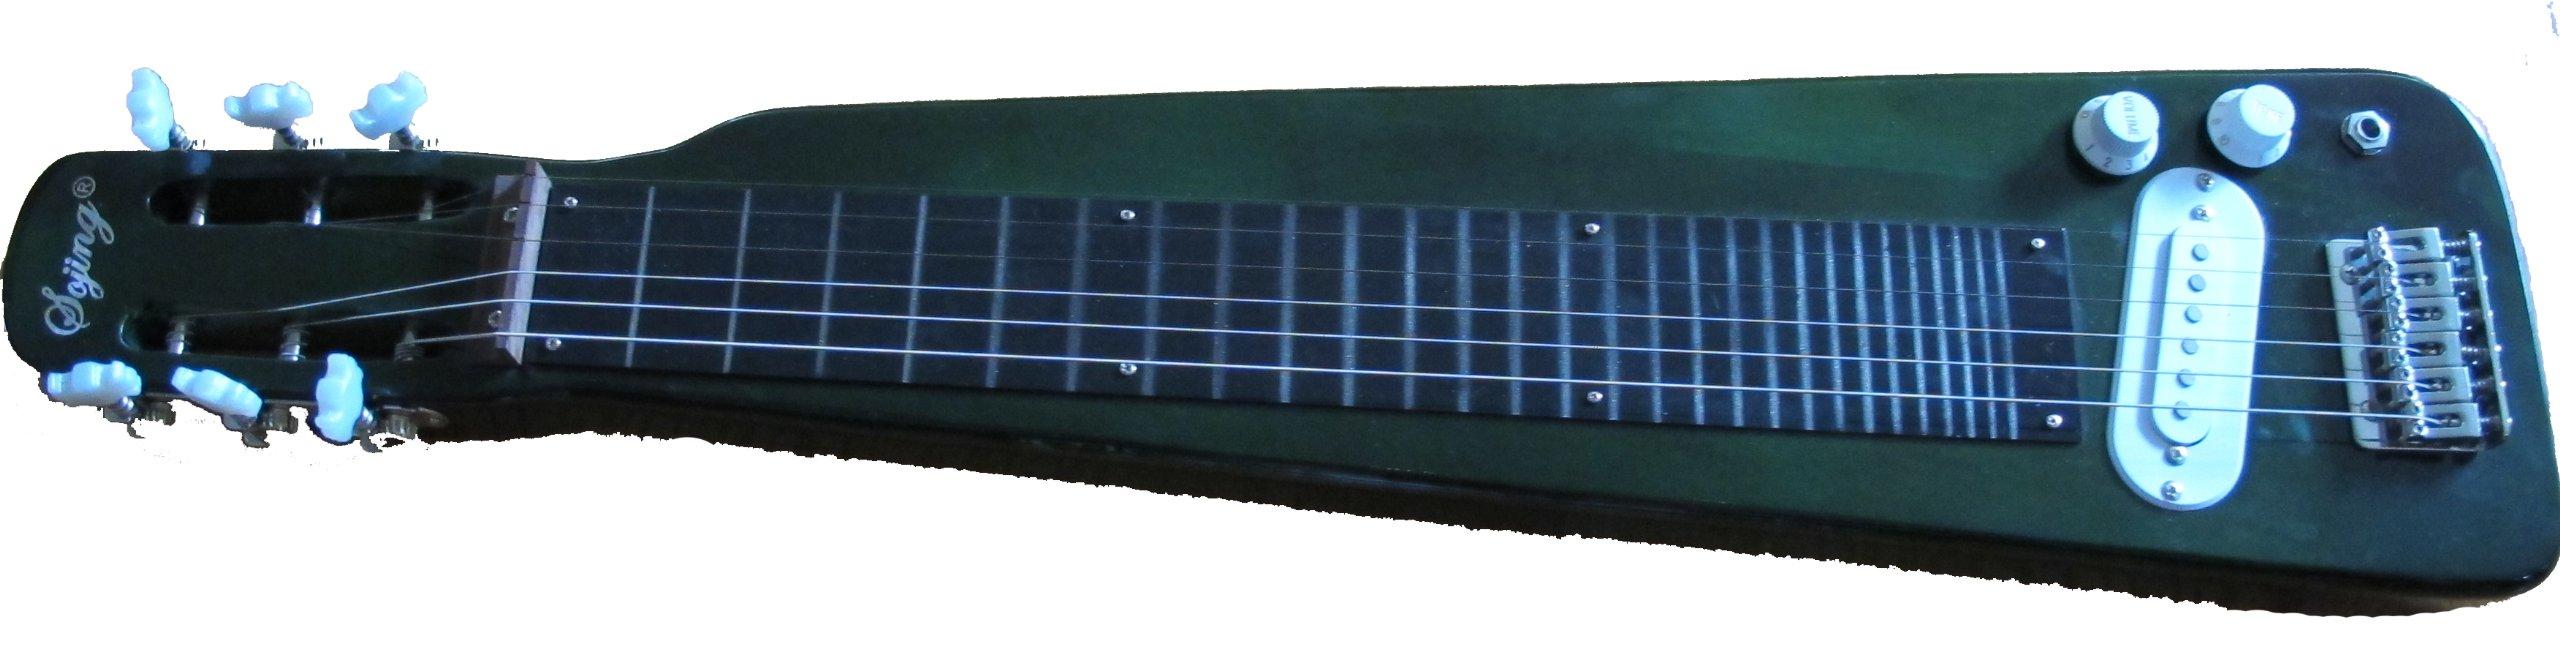 Sojing Lap Steel Hawaii Guitar(green)